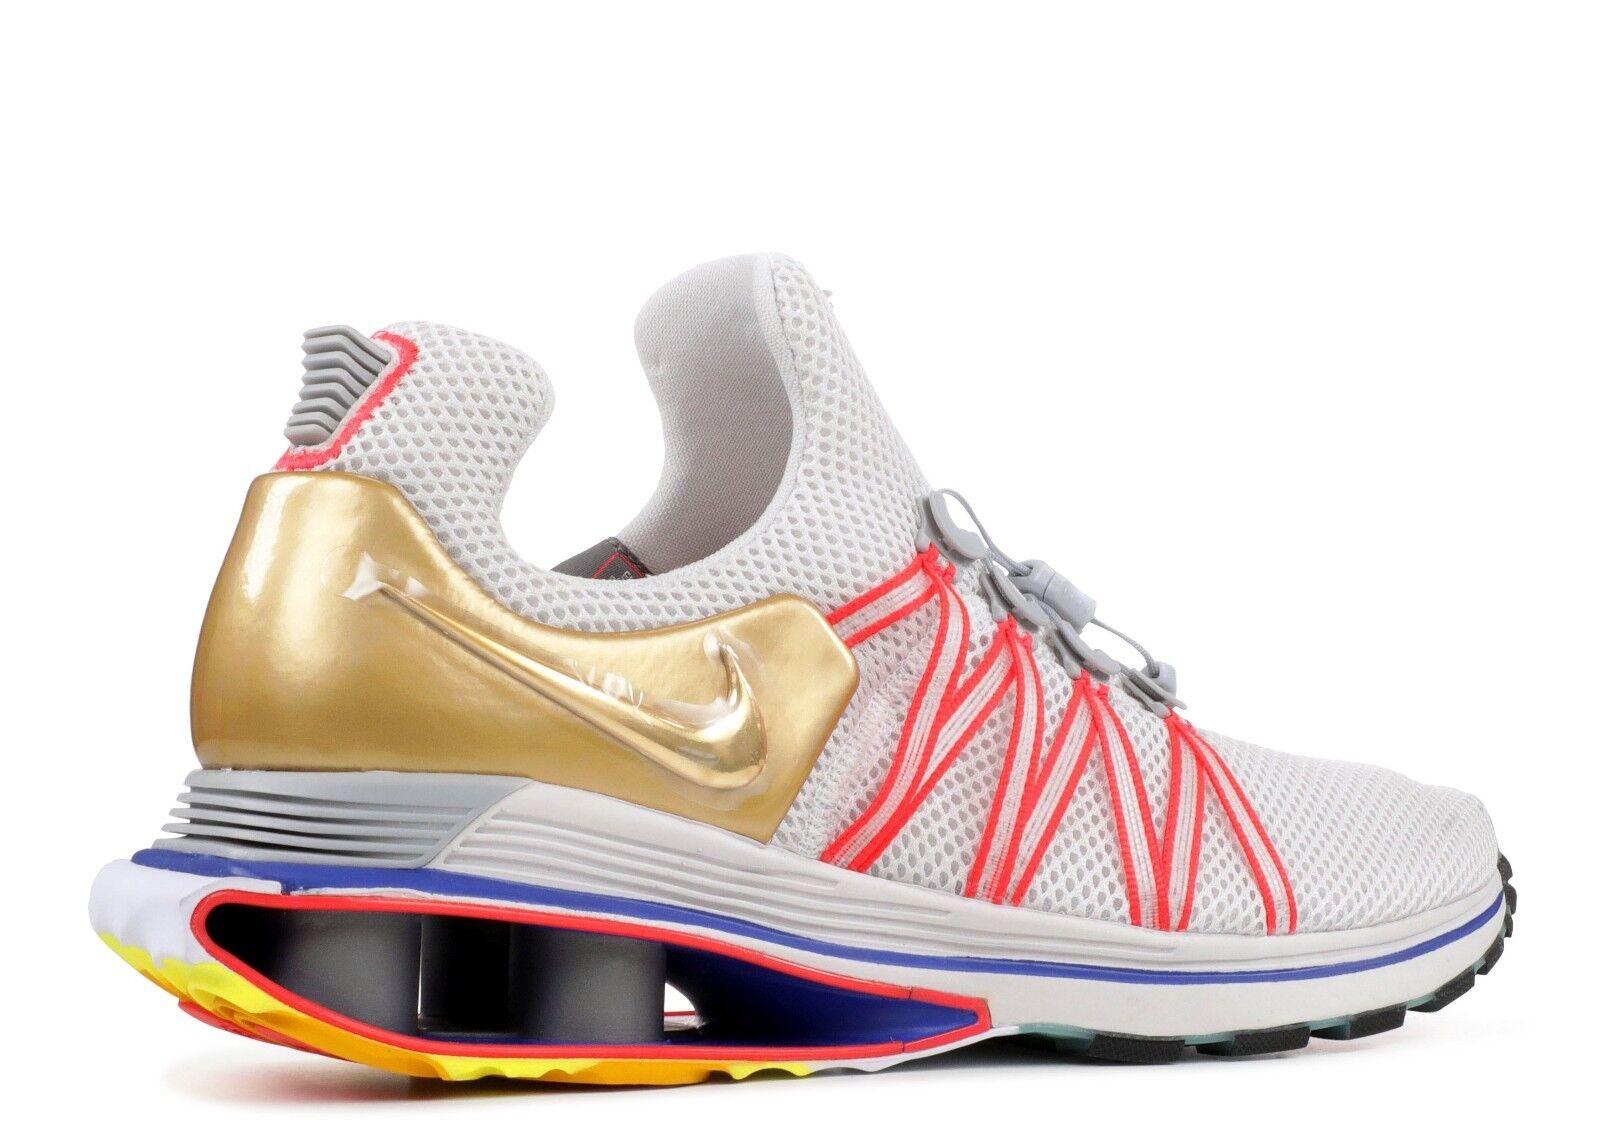 Nike Shox Gravity AQ8553-009 Vast Grey Metallic gold Mens Sz 12